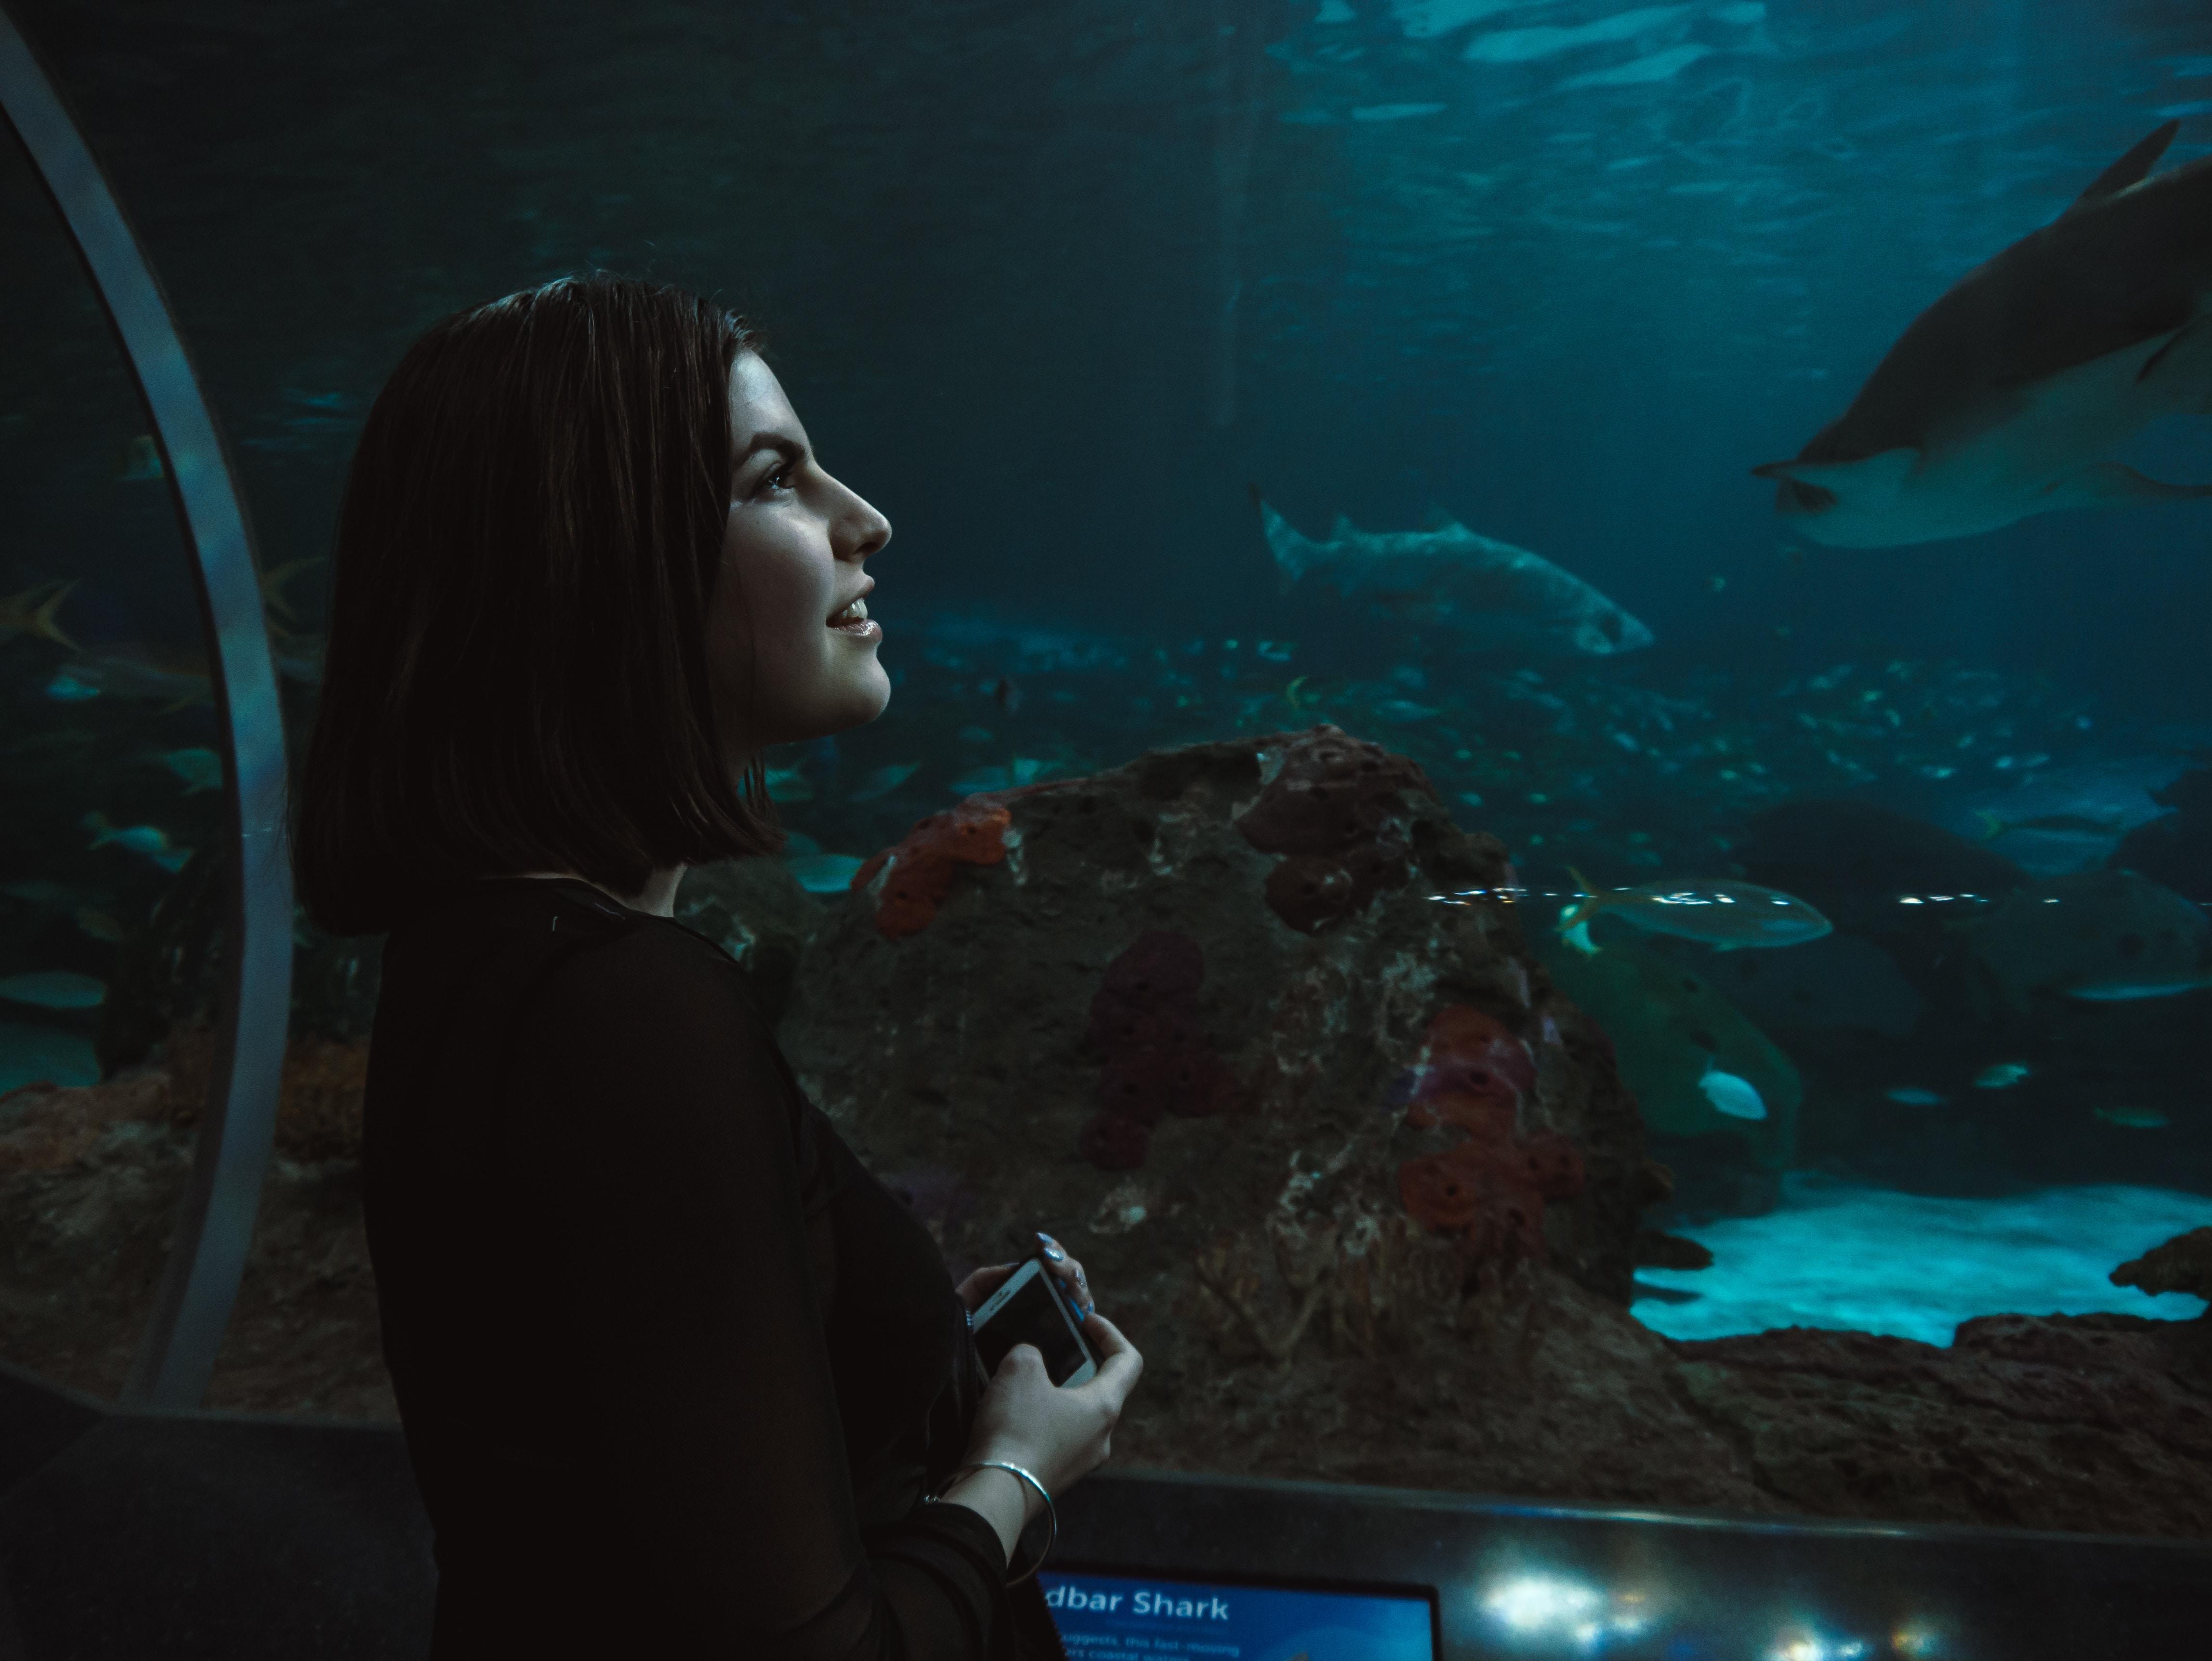 woman wearing black long-sleeved shirt facing the aquarium